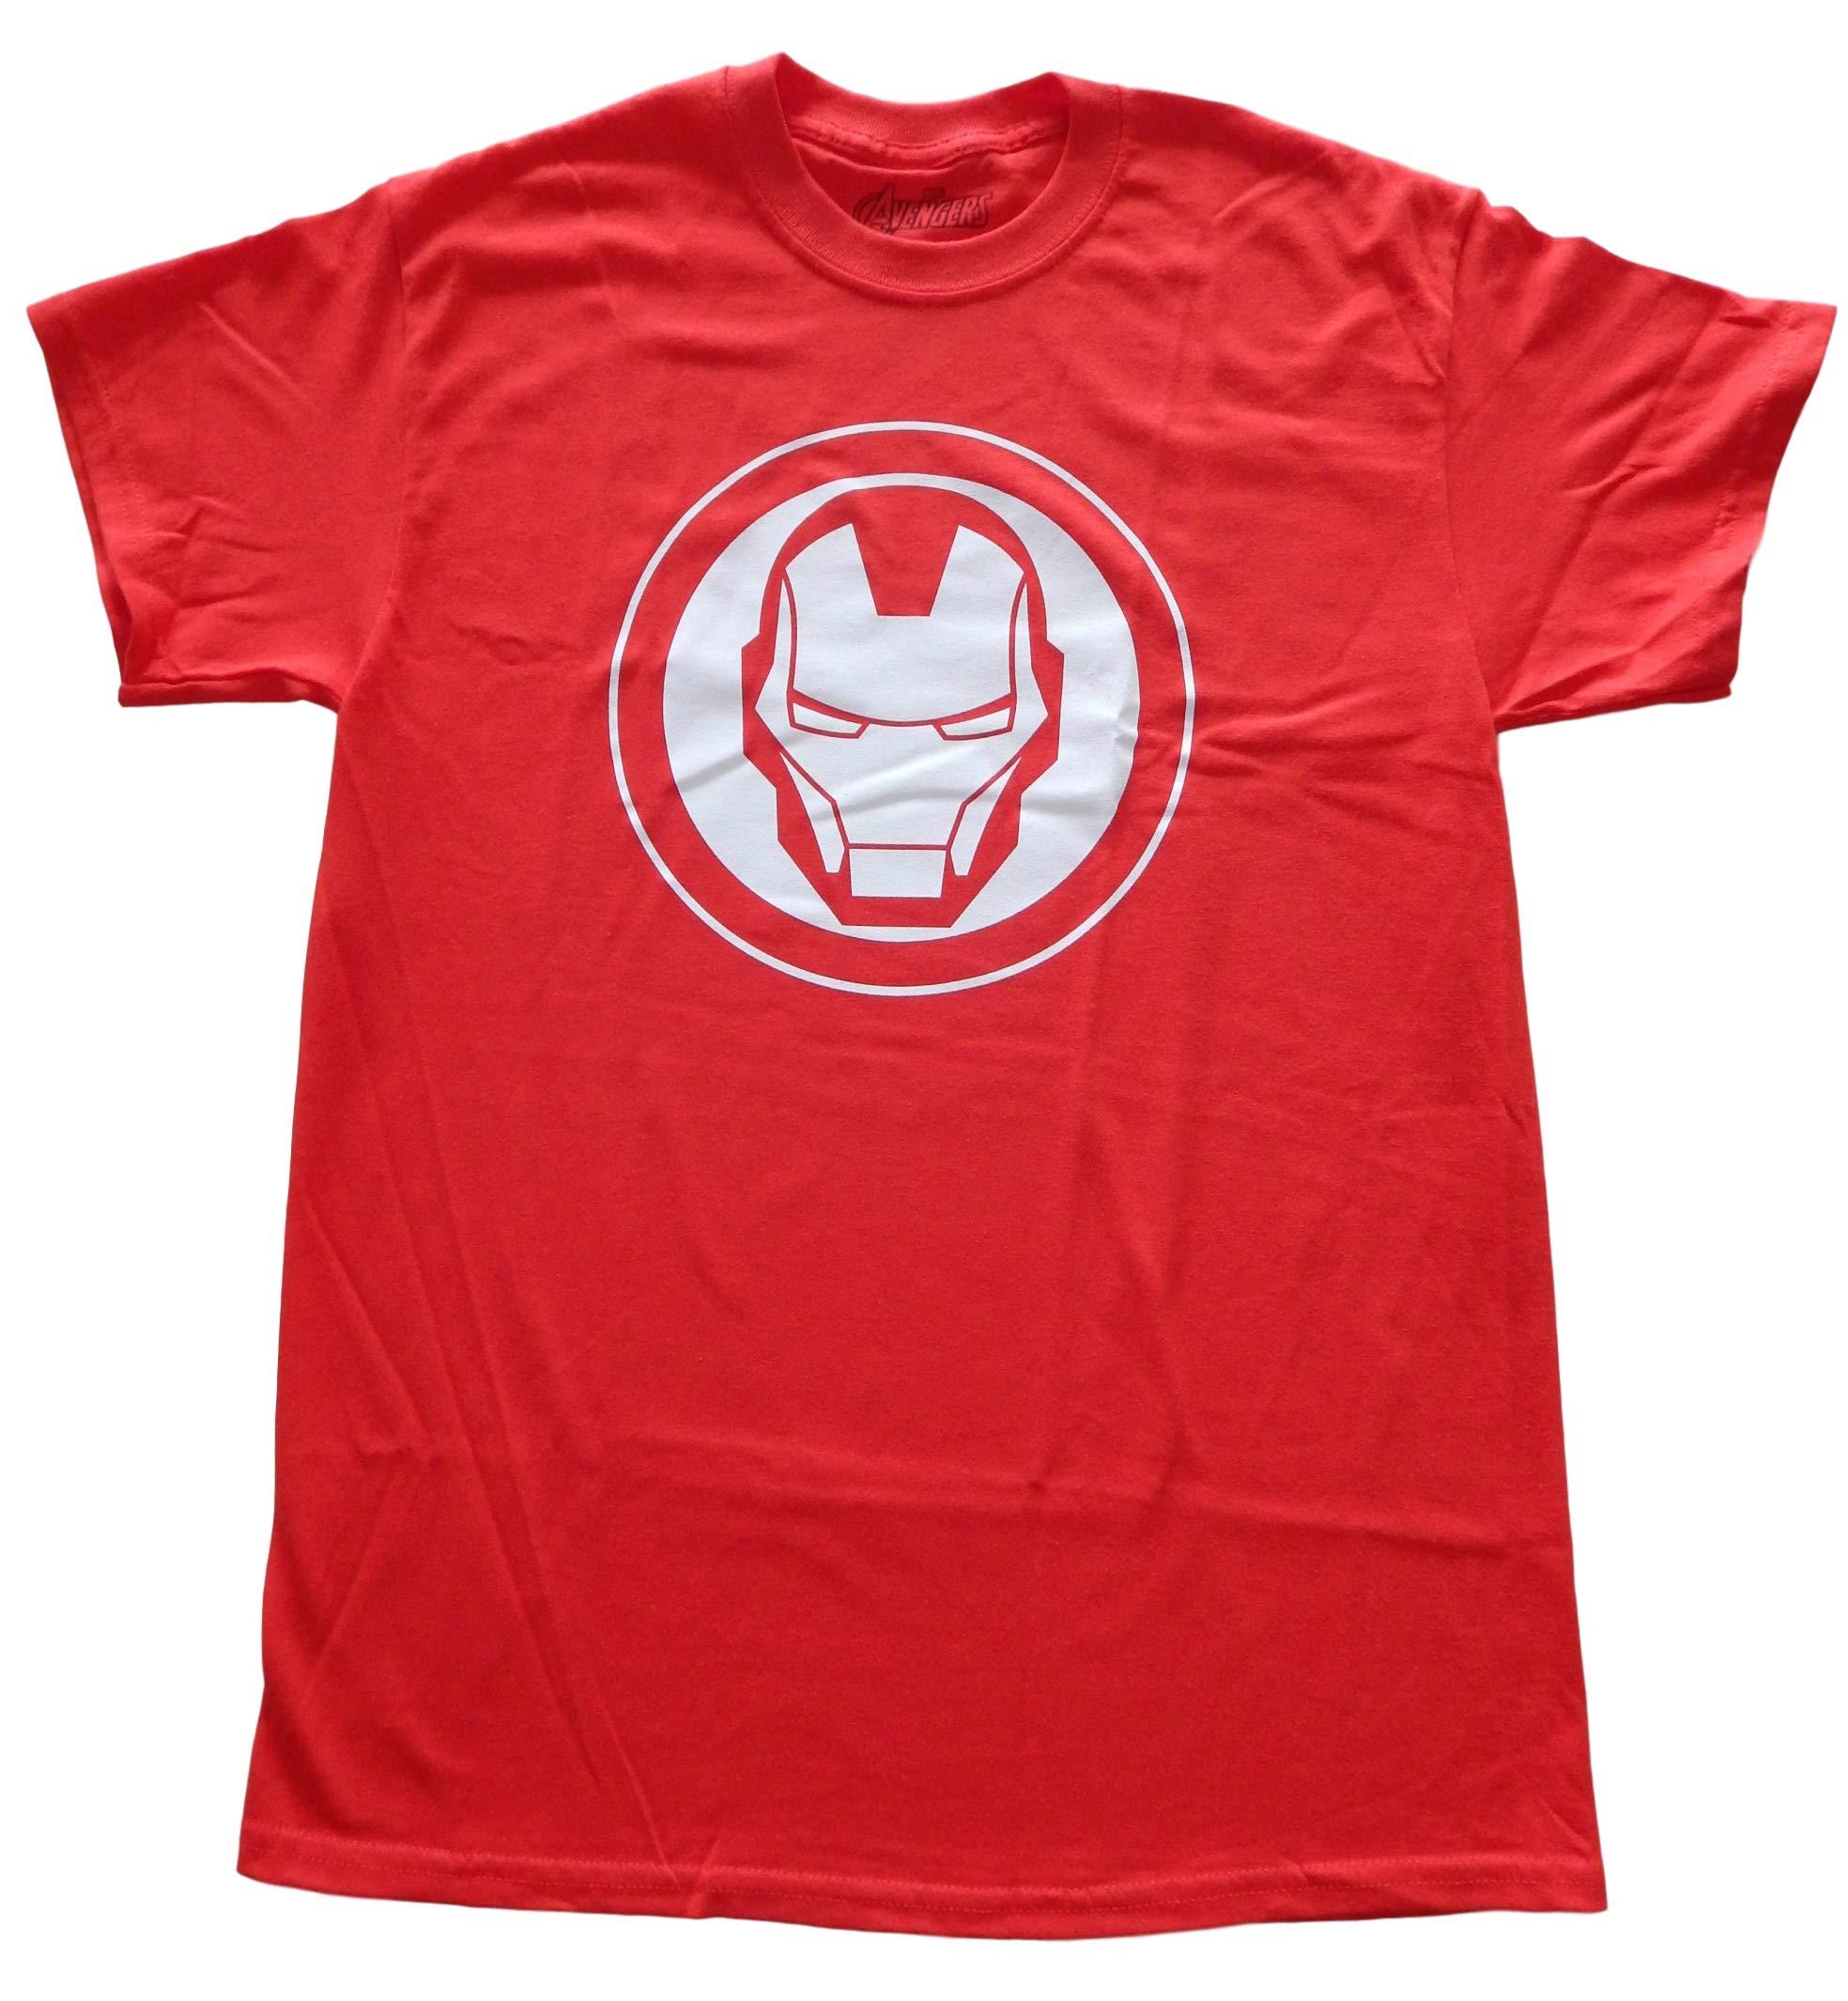 iron man t shirt philippines